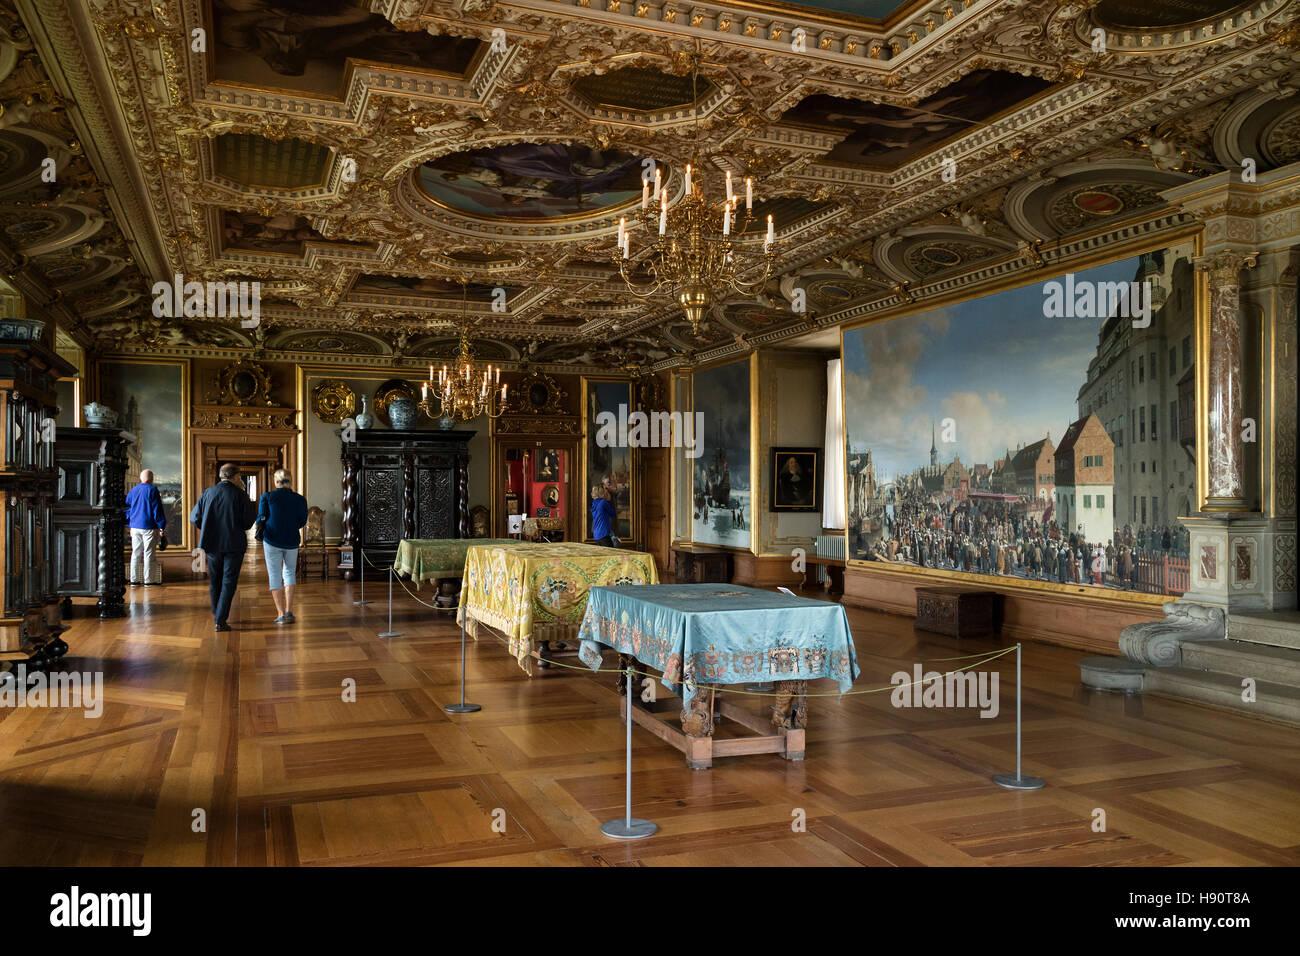 Dekorierten Decke im Schloss Frederiksborg in Hillerod, Dänemark Stockbild